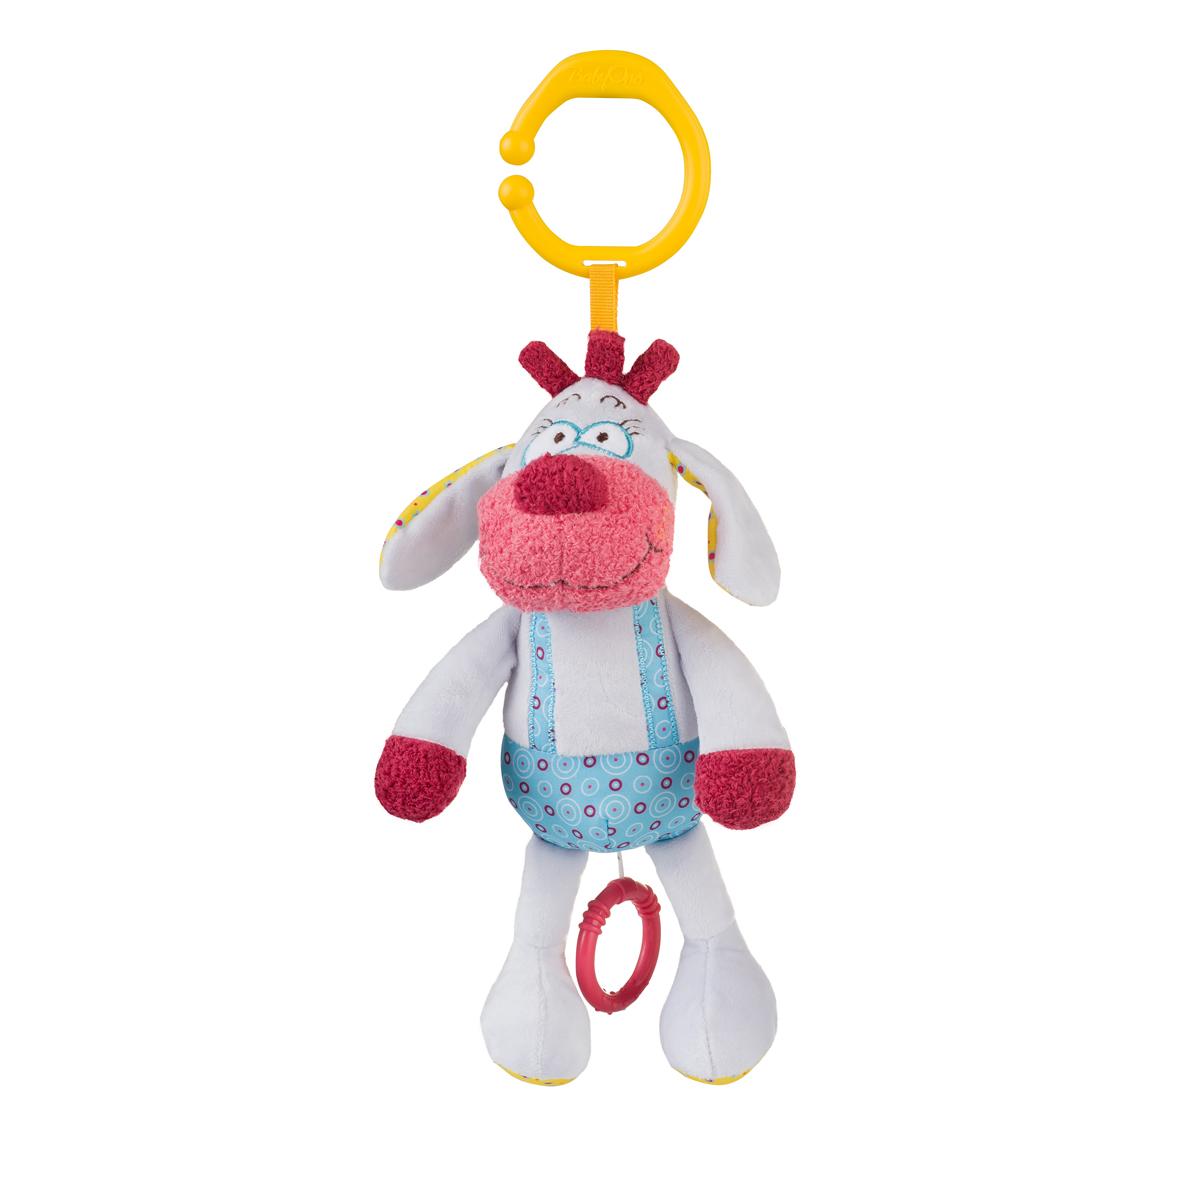 1611 BabyOno glazbena igračka kravica Simon